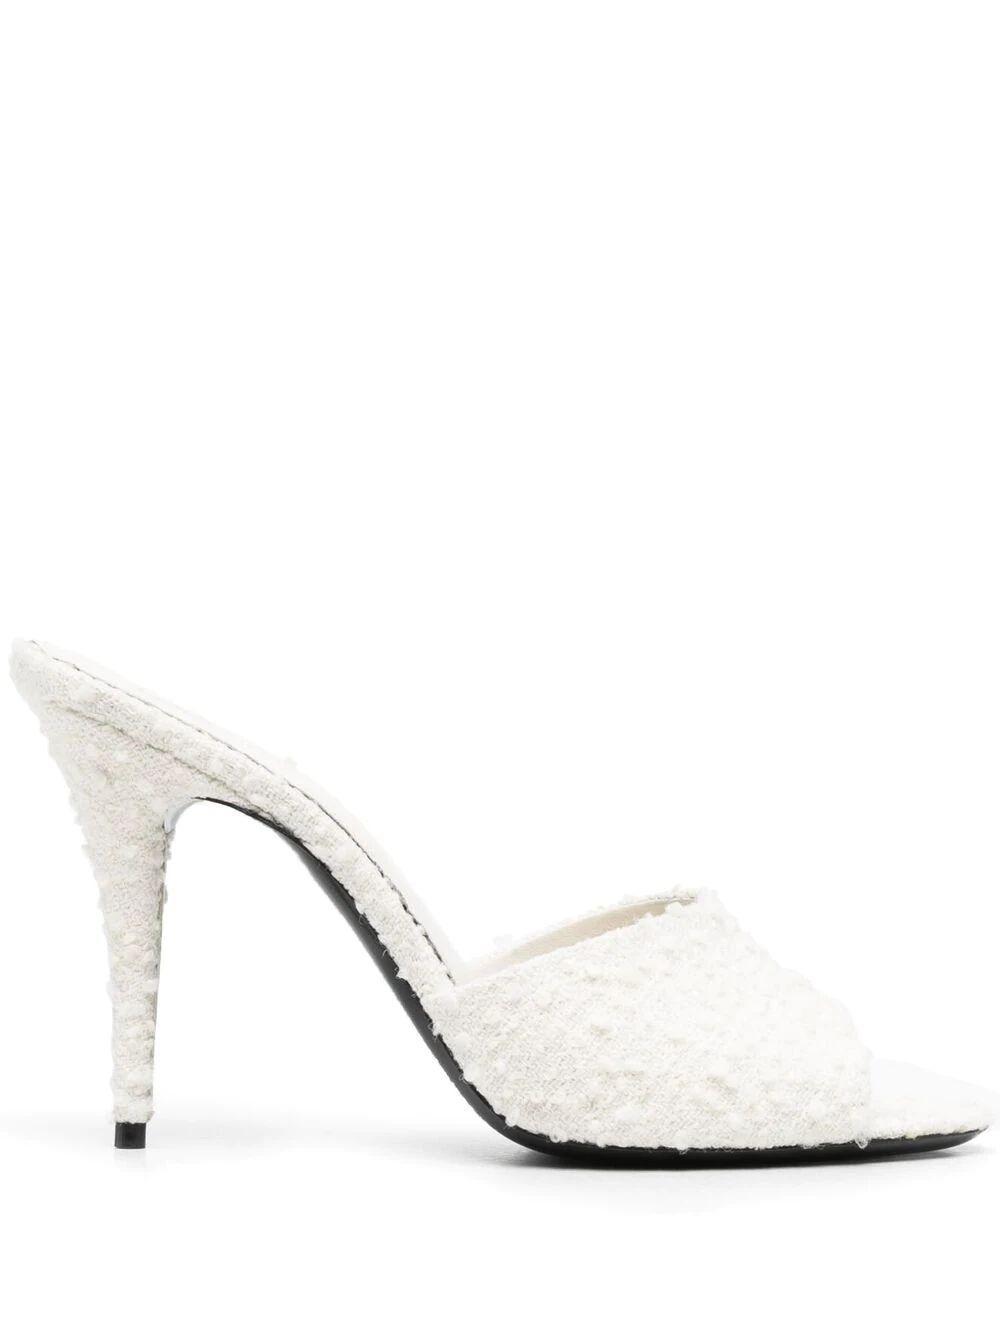 95mm Mule Sandal Item # 6702530CO00